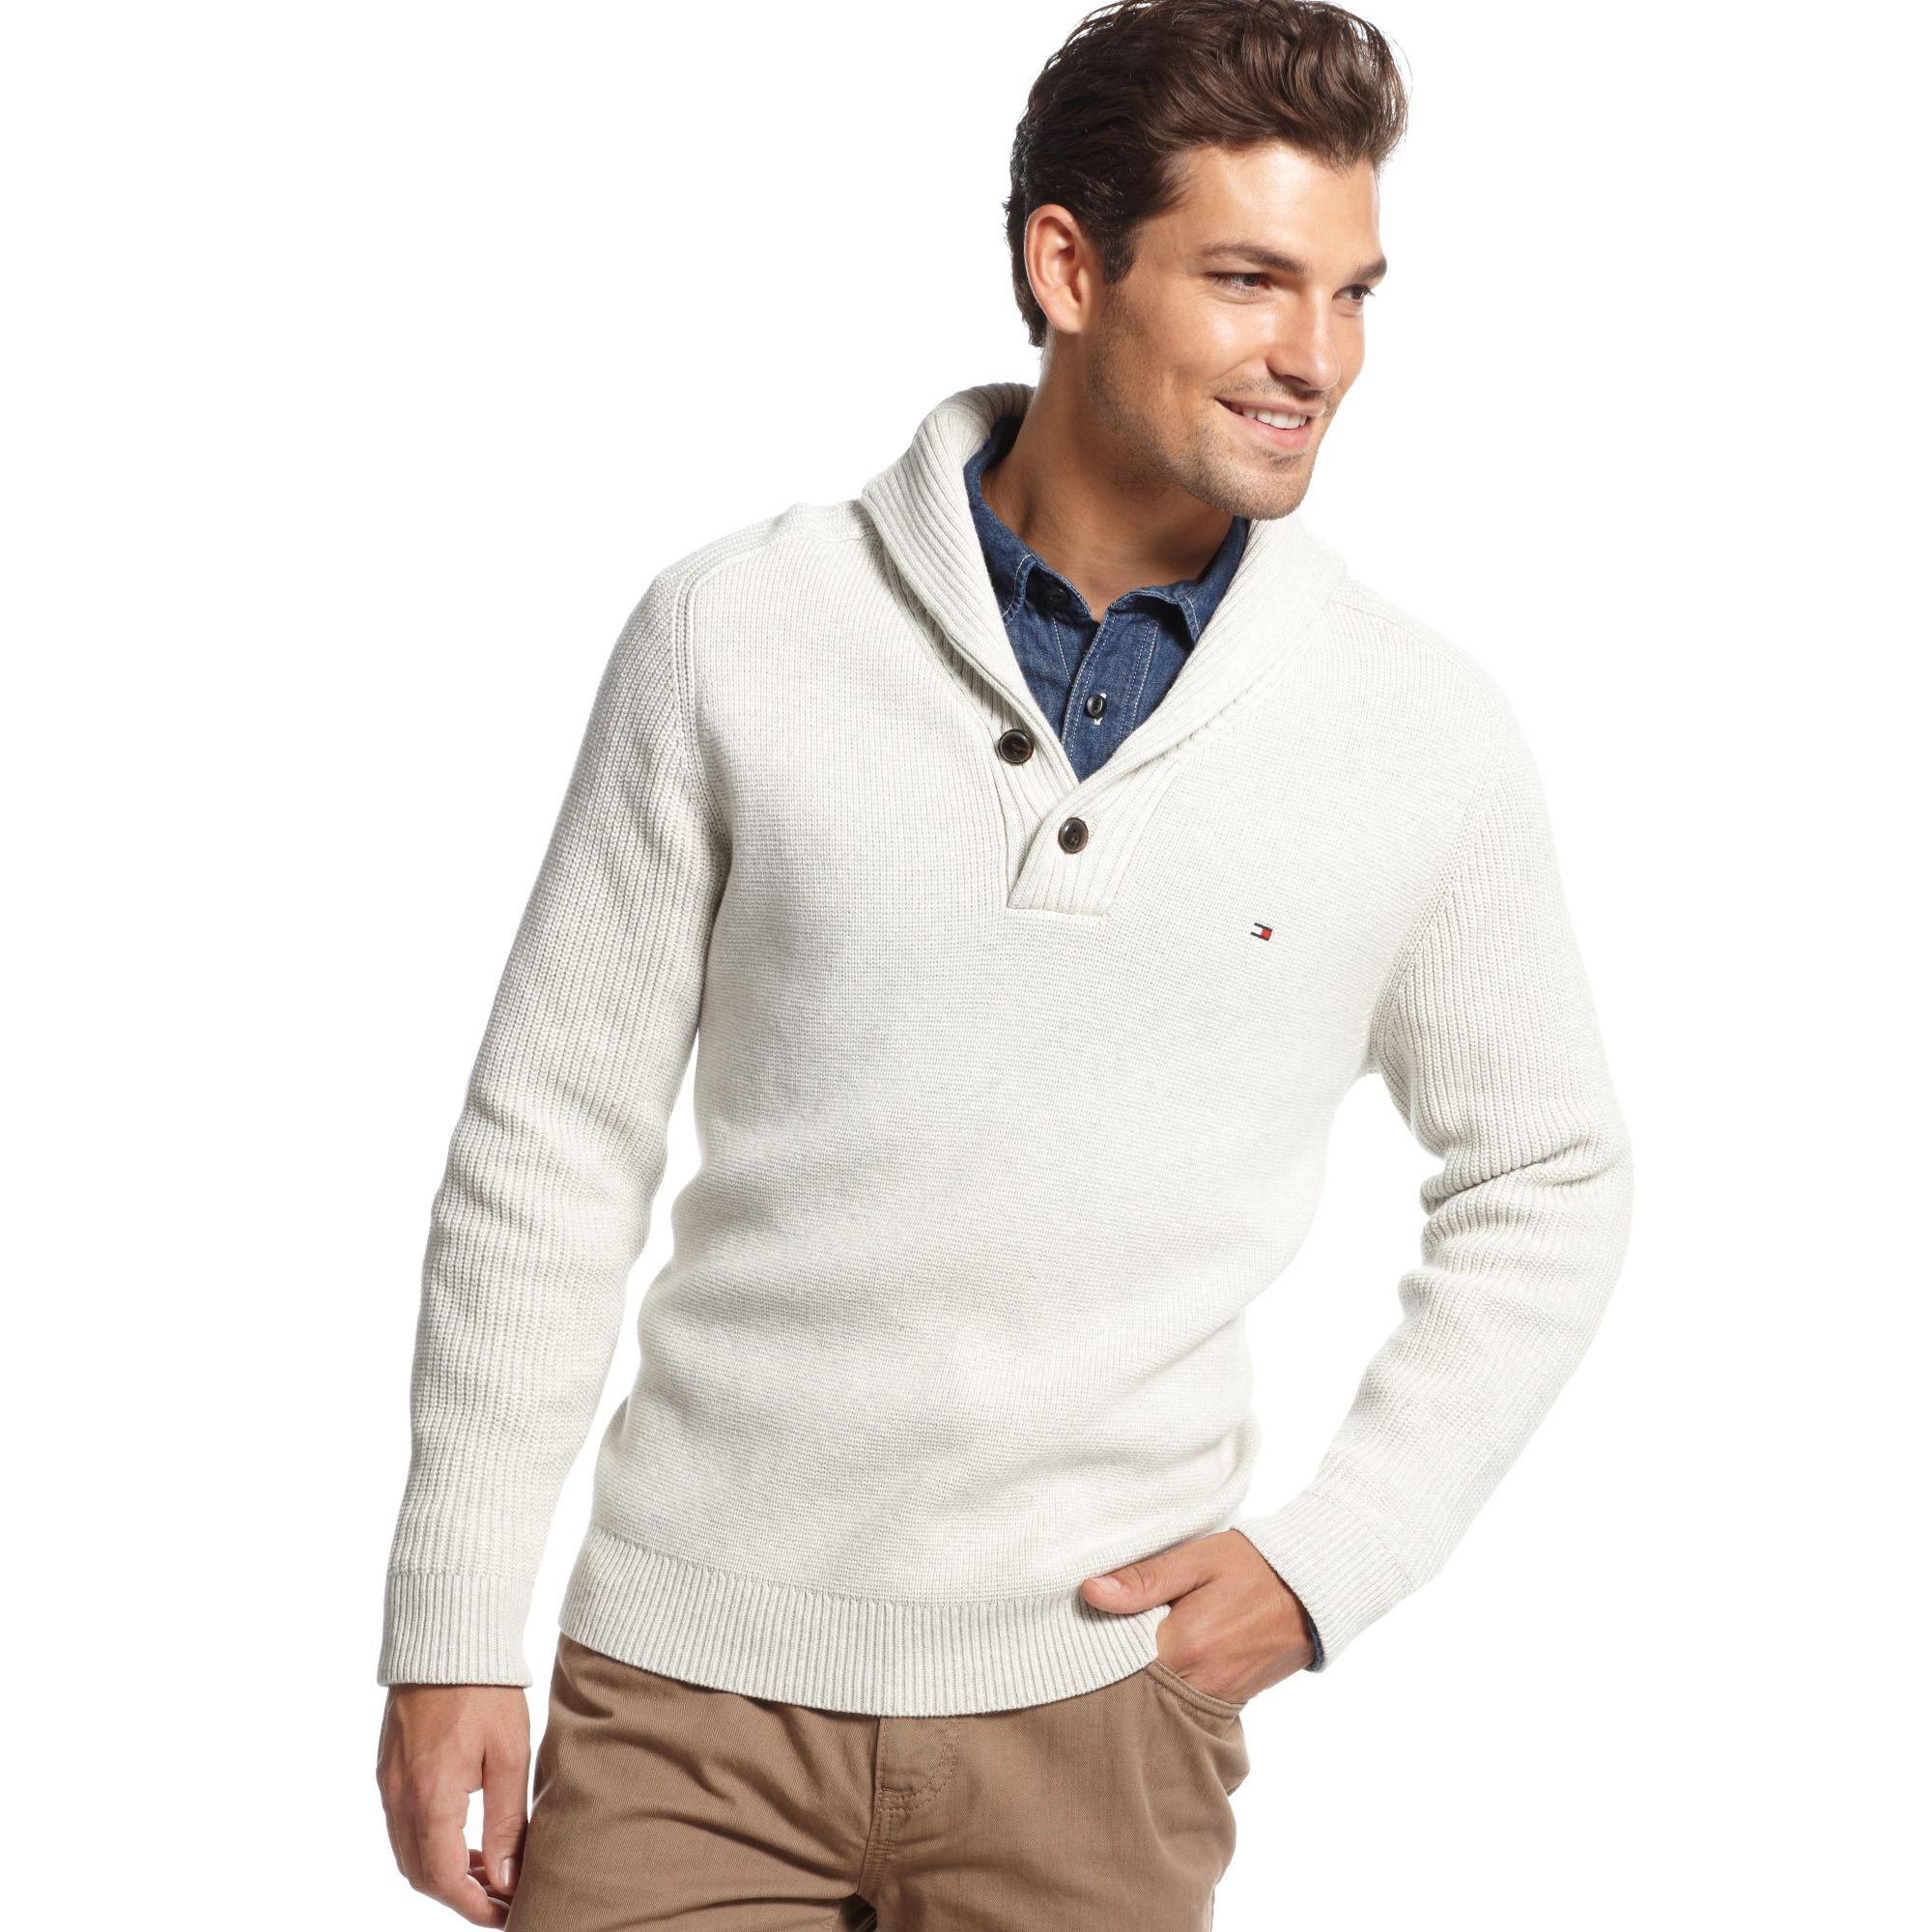 4b763d5e651e Lyst - Tommy Hilfiger Adler Shawl Collar Sweater in White for Men